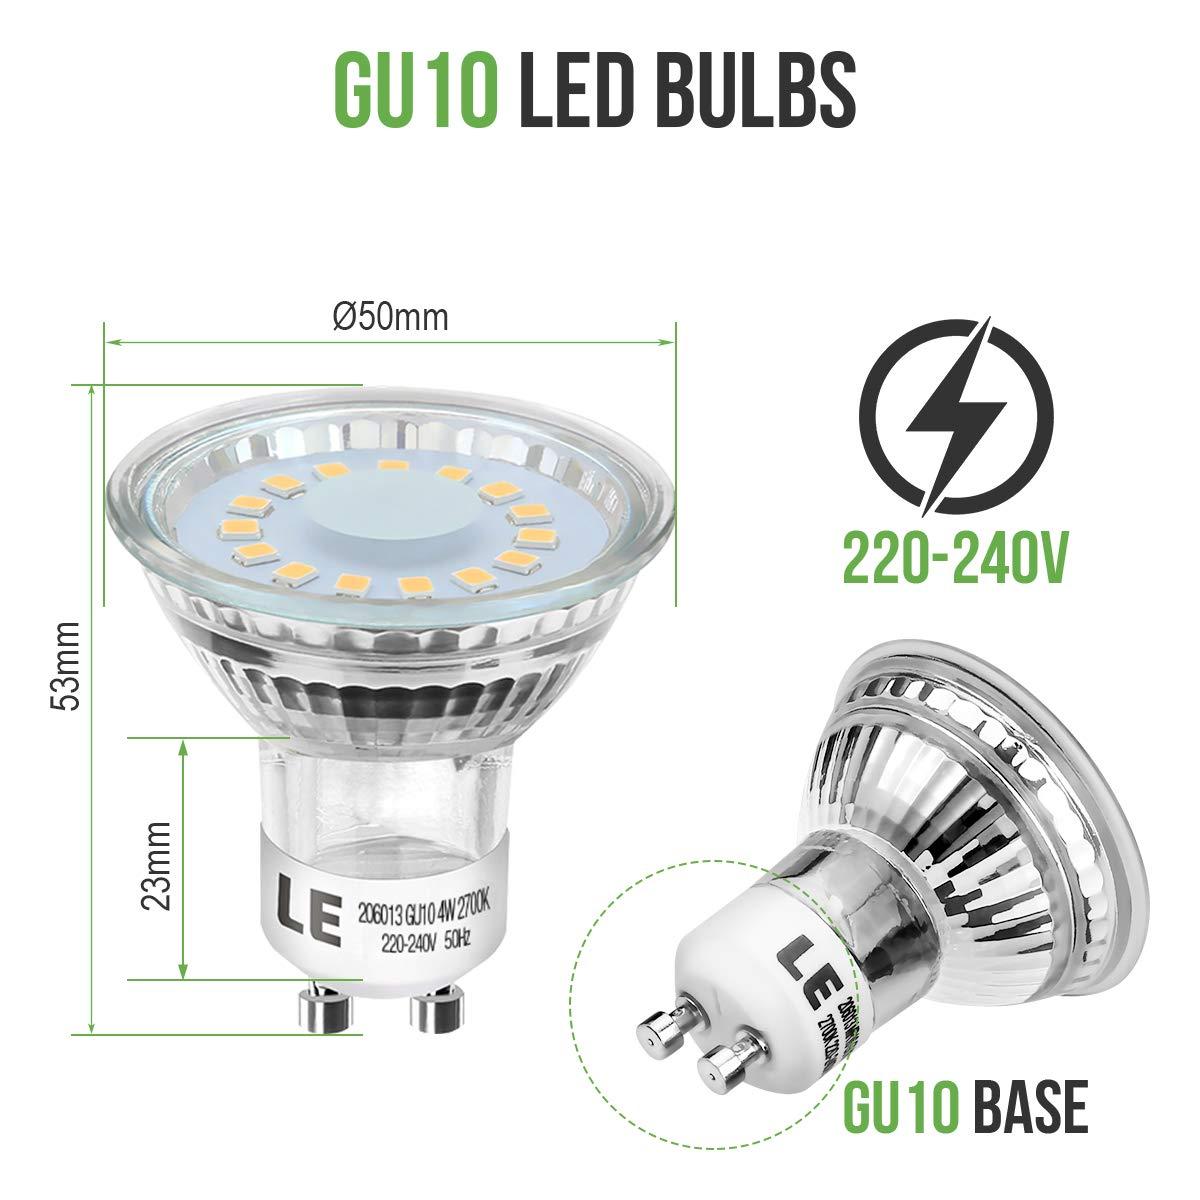 Lighting EVER Blanco C/álido 2700K Bombillas LED GU10-4W = 50W Hal/ógena paquete de 10